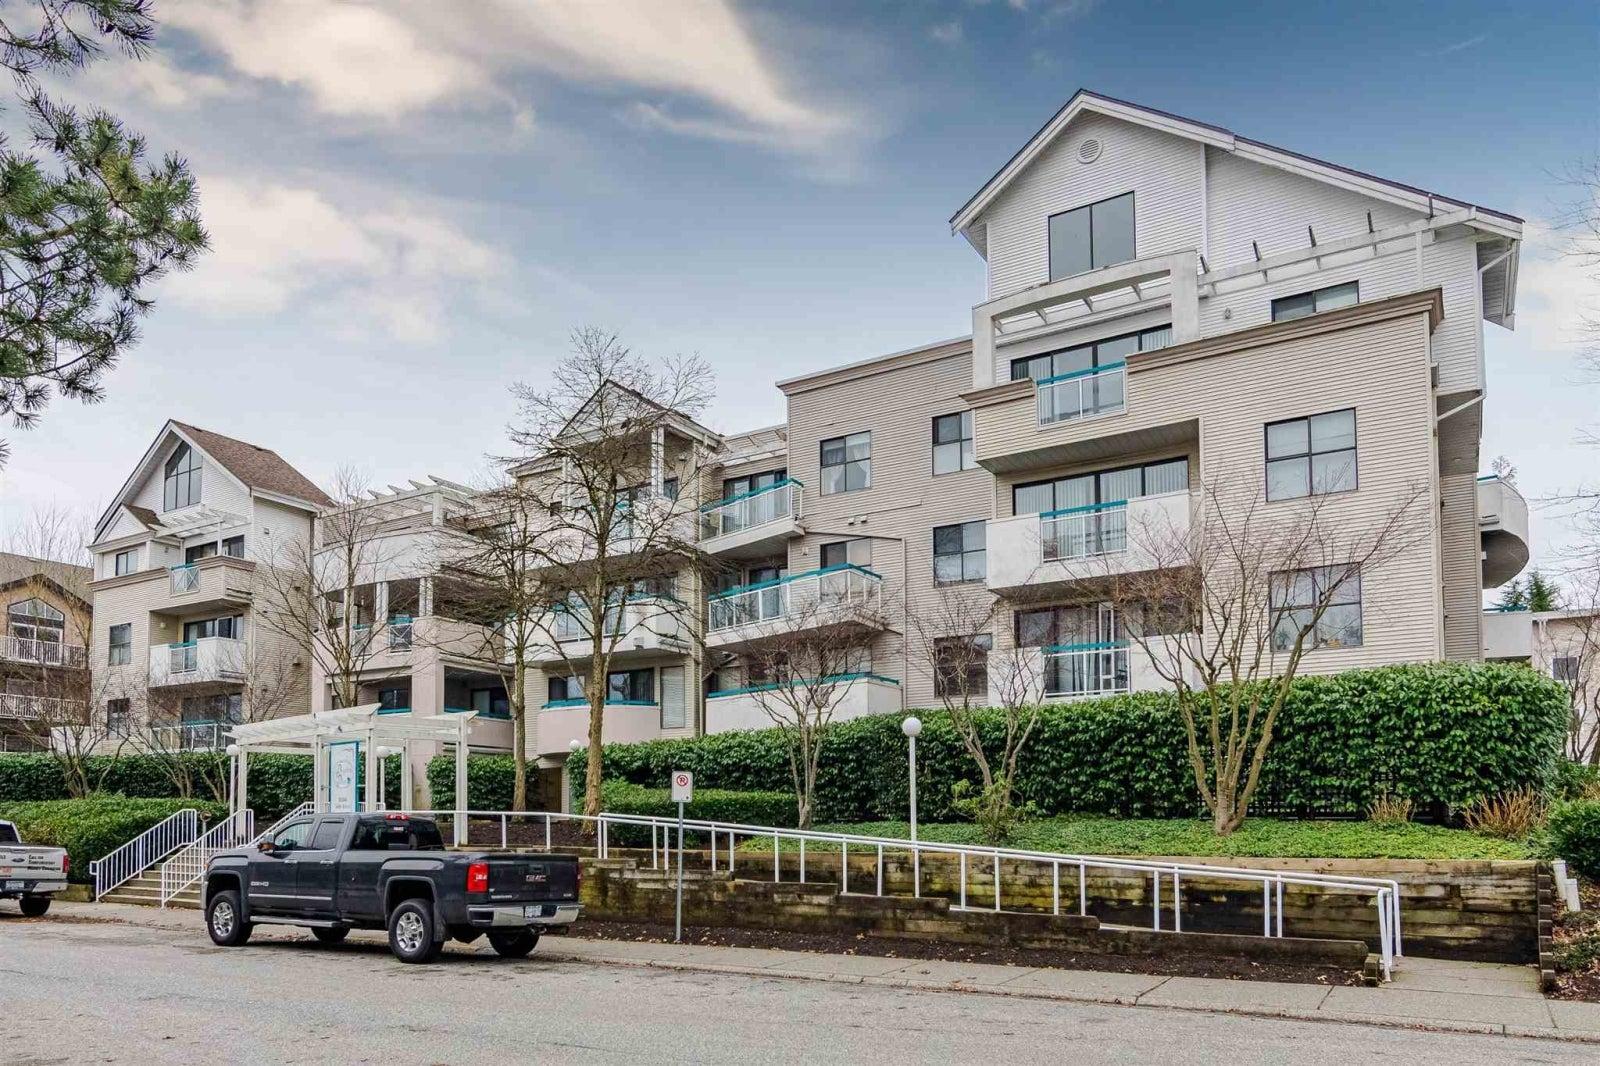 405 20268 54 AVENUE - Langley City Apartment/Condo for sale, 2 Bedrooms (R2604183) #1